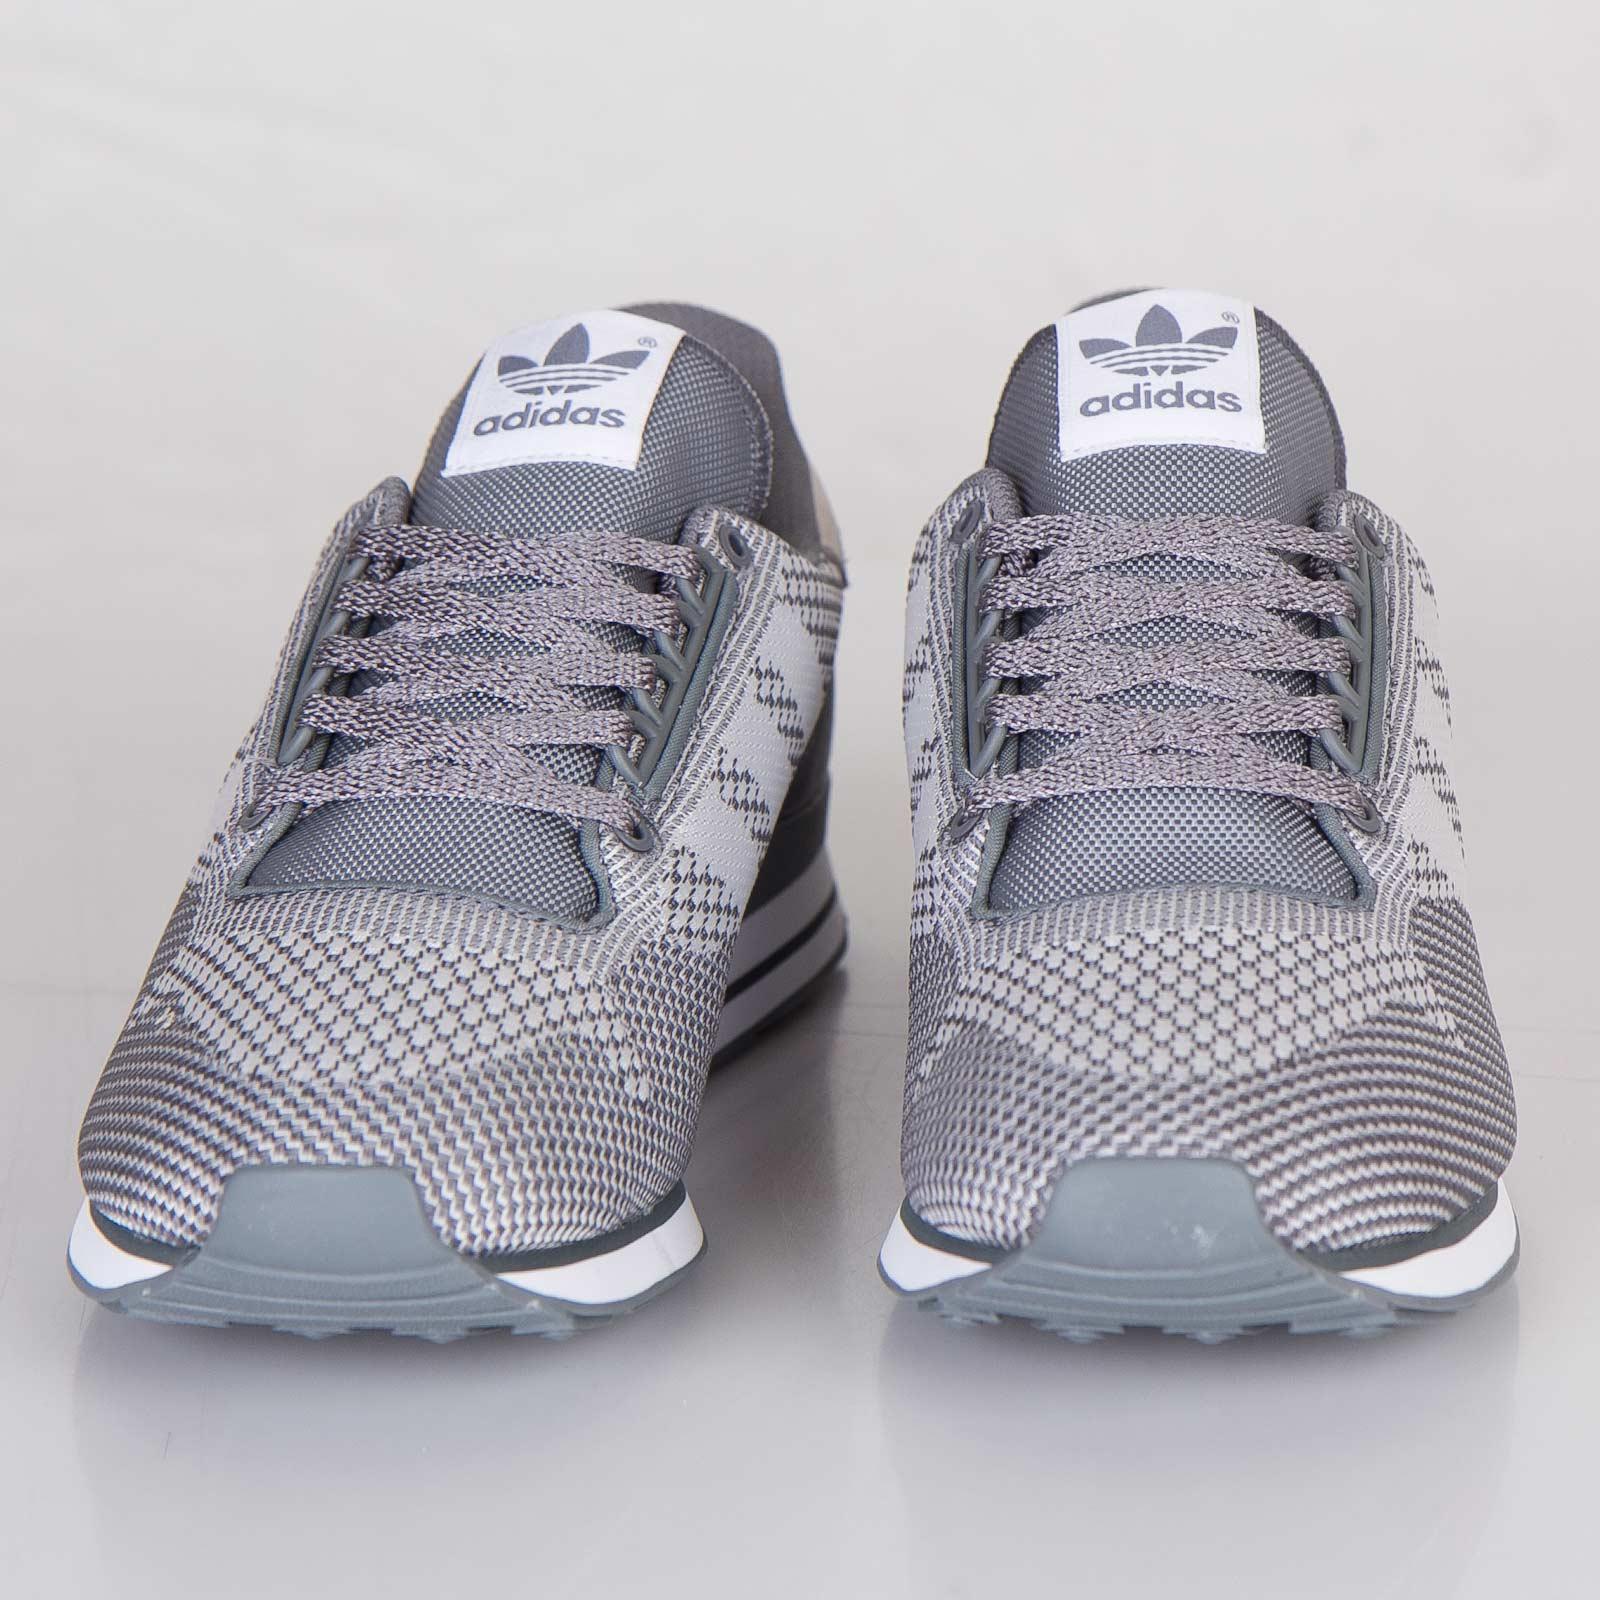 adidas ZX 500 OG Weave - M20995 - Sneakersnstuff  8c973bb0d